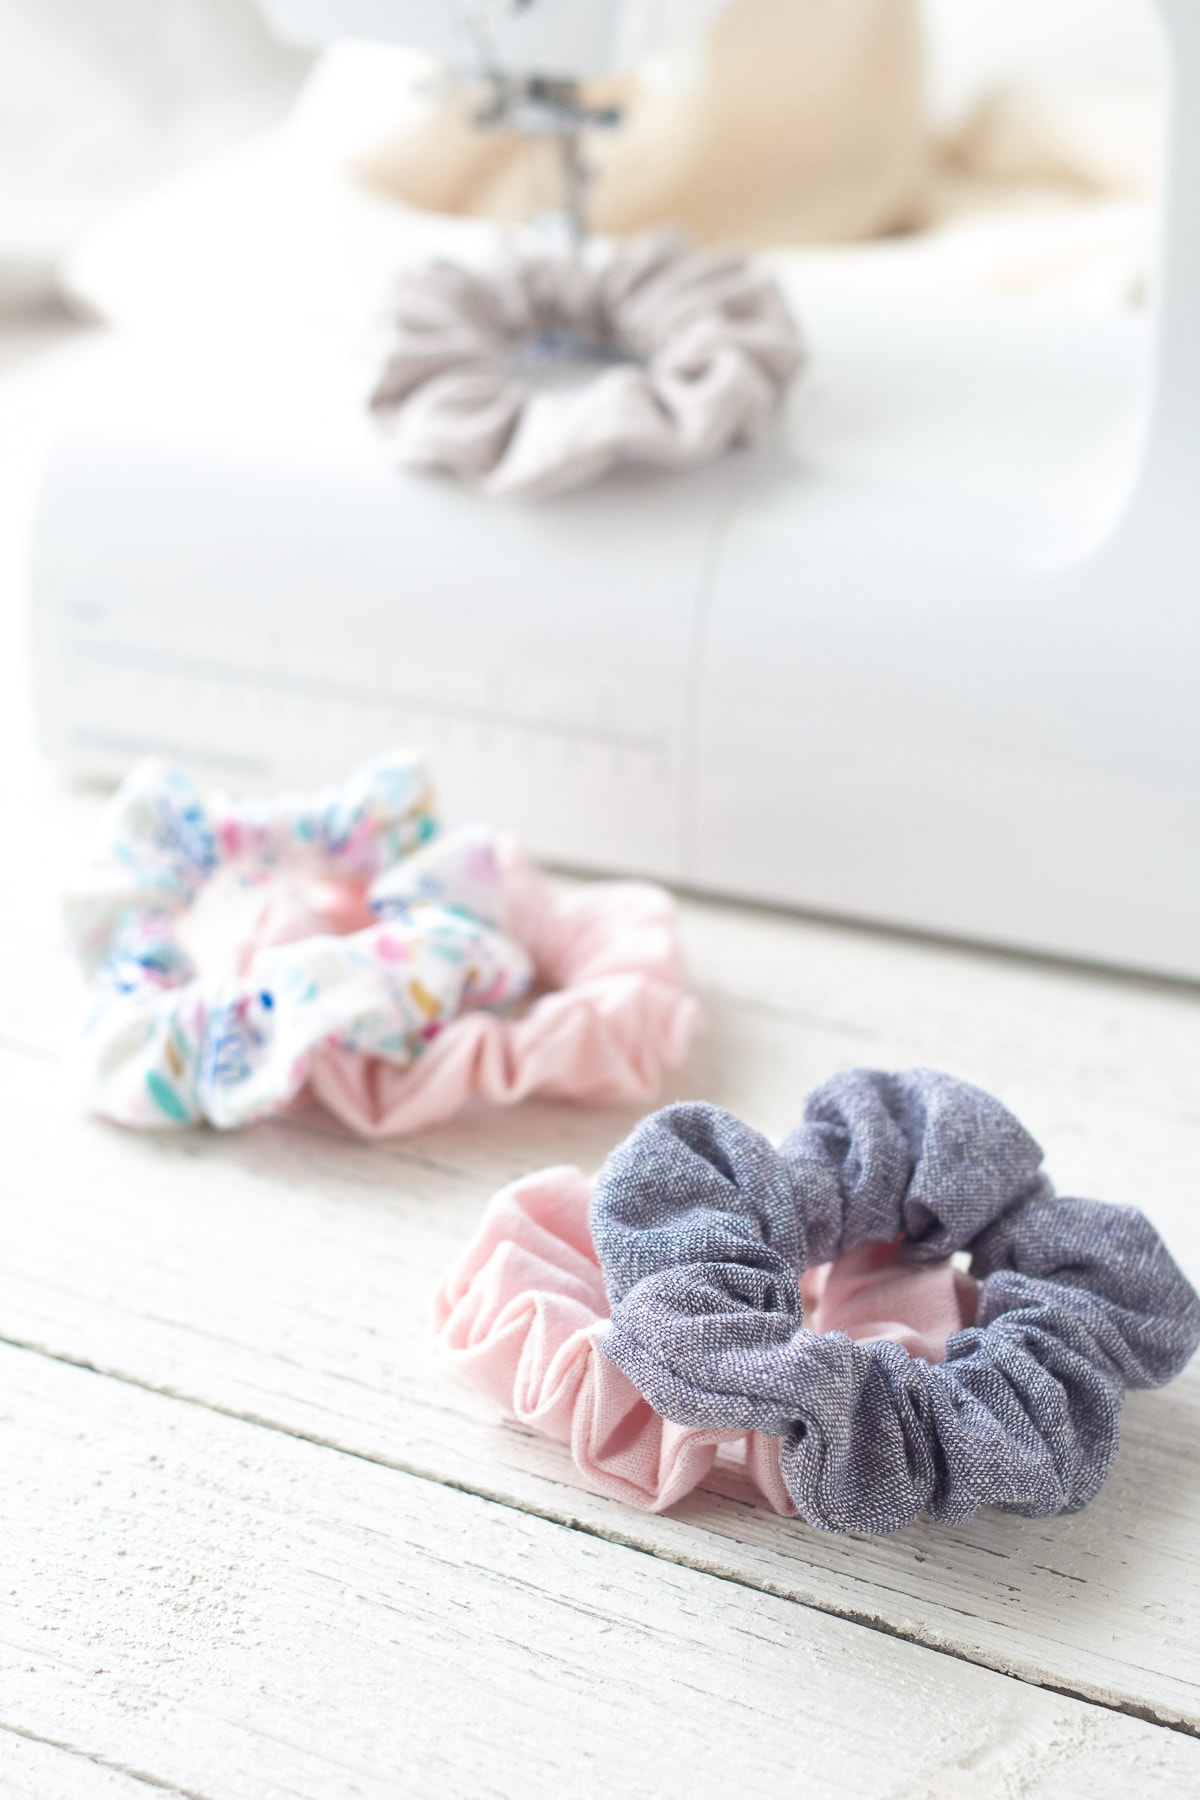 Handmade linen scrunchies around a white sewing machine.